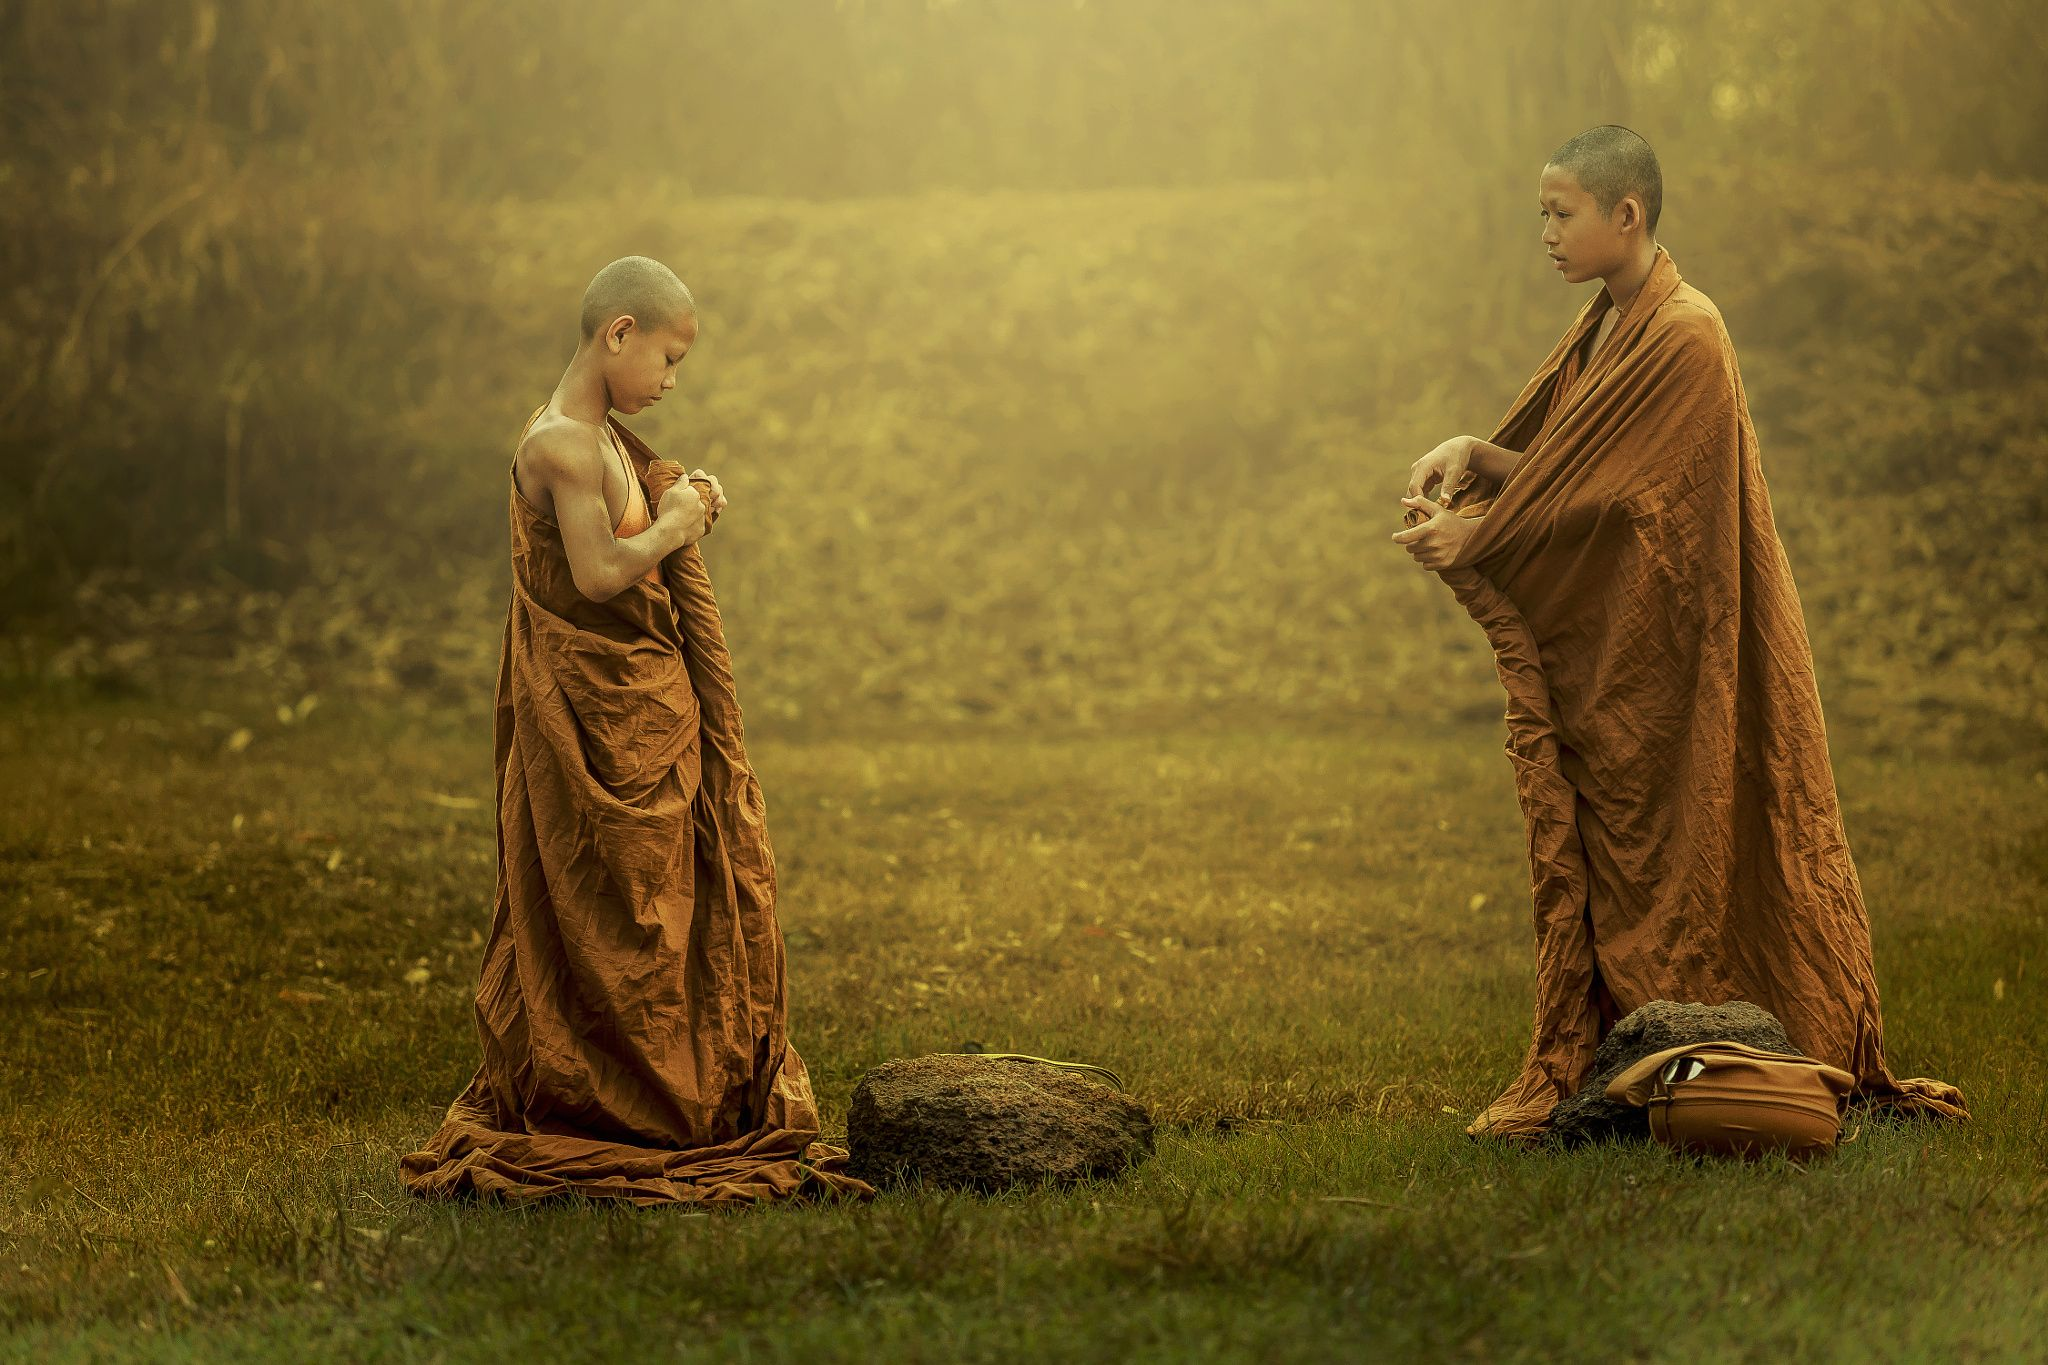 Burmese Buddhist Monk In Mandalay Editorial Image - Image